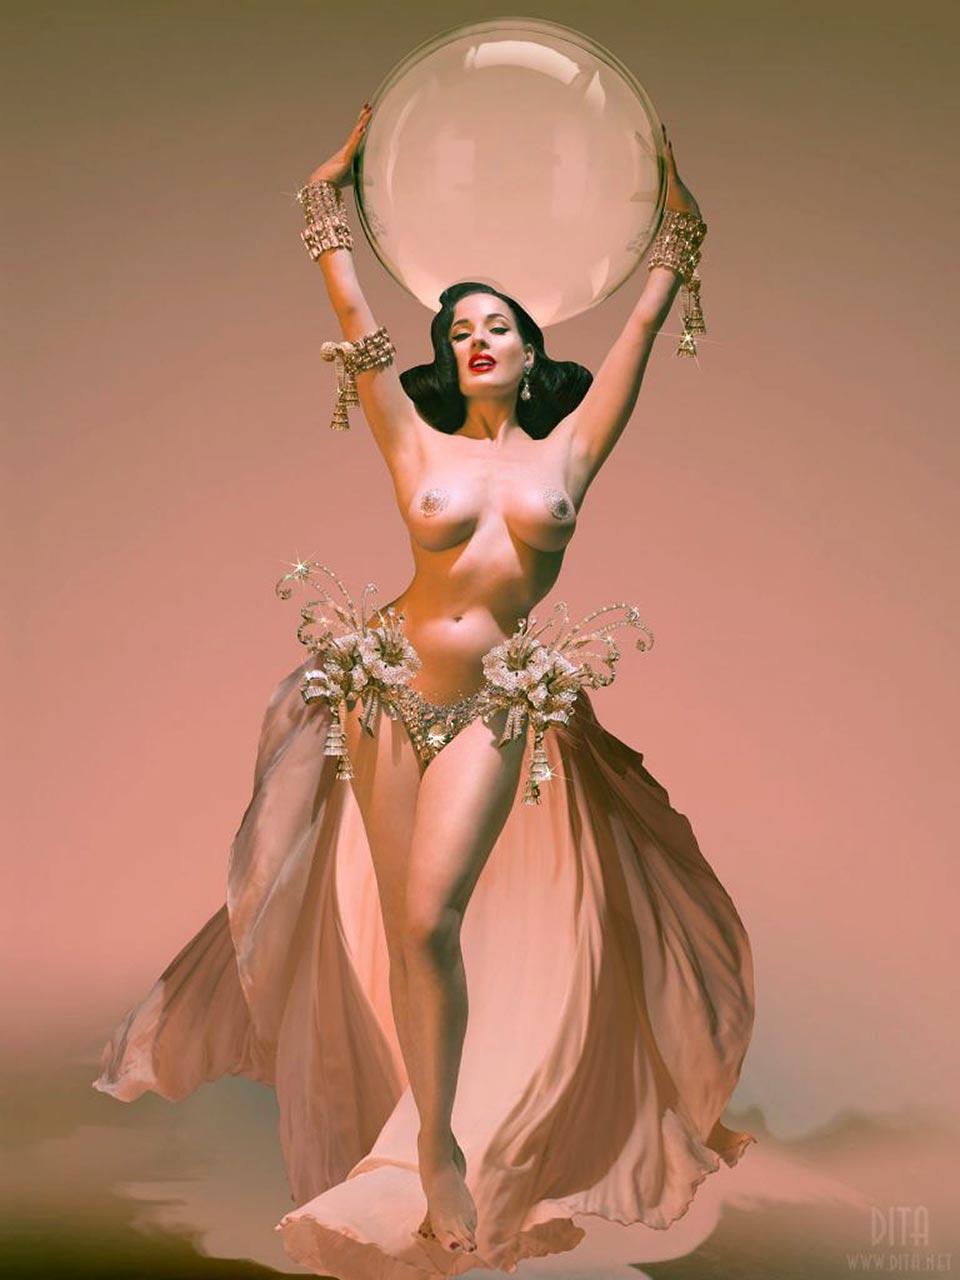 Marilyn manson sex video sims 4 - 2 part 1